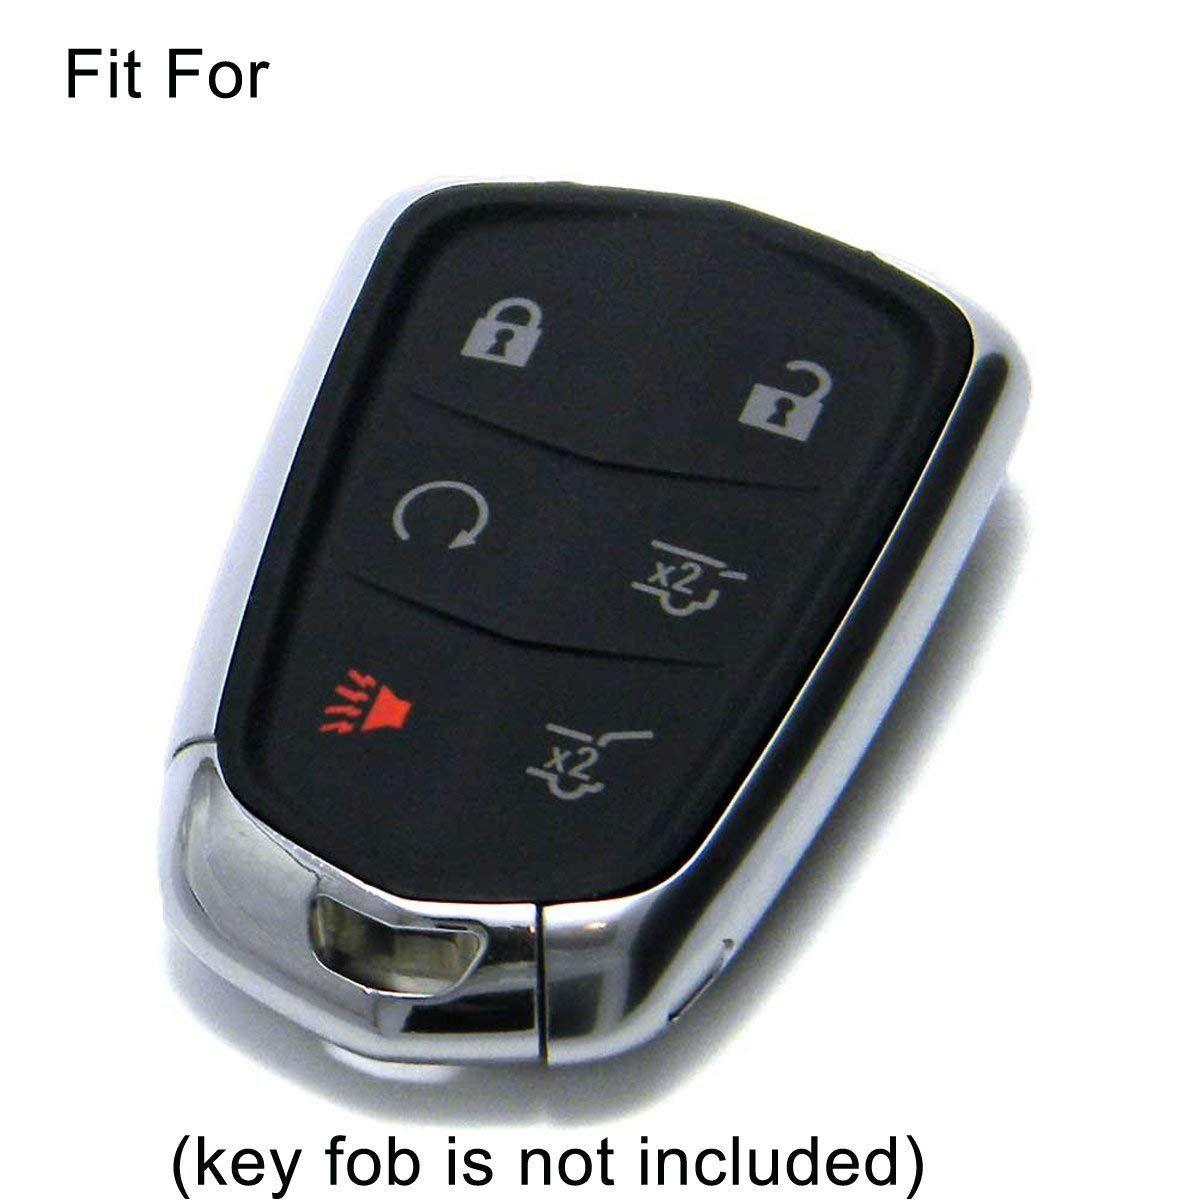 HYQ2AB 2 Smart Key Fobs fits Cadillac Escalade 2015 2016 2017 2018 2019 2020 Keyless Entry Remote